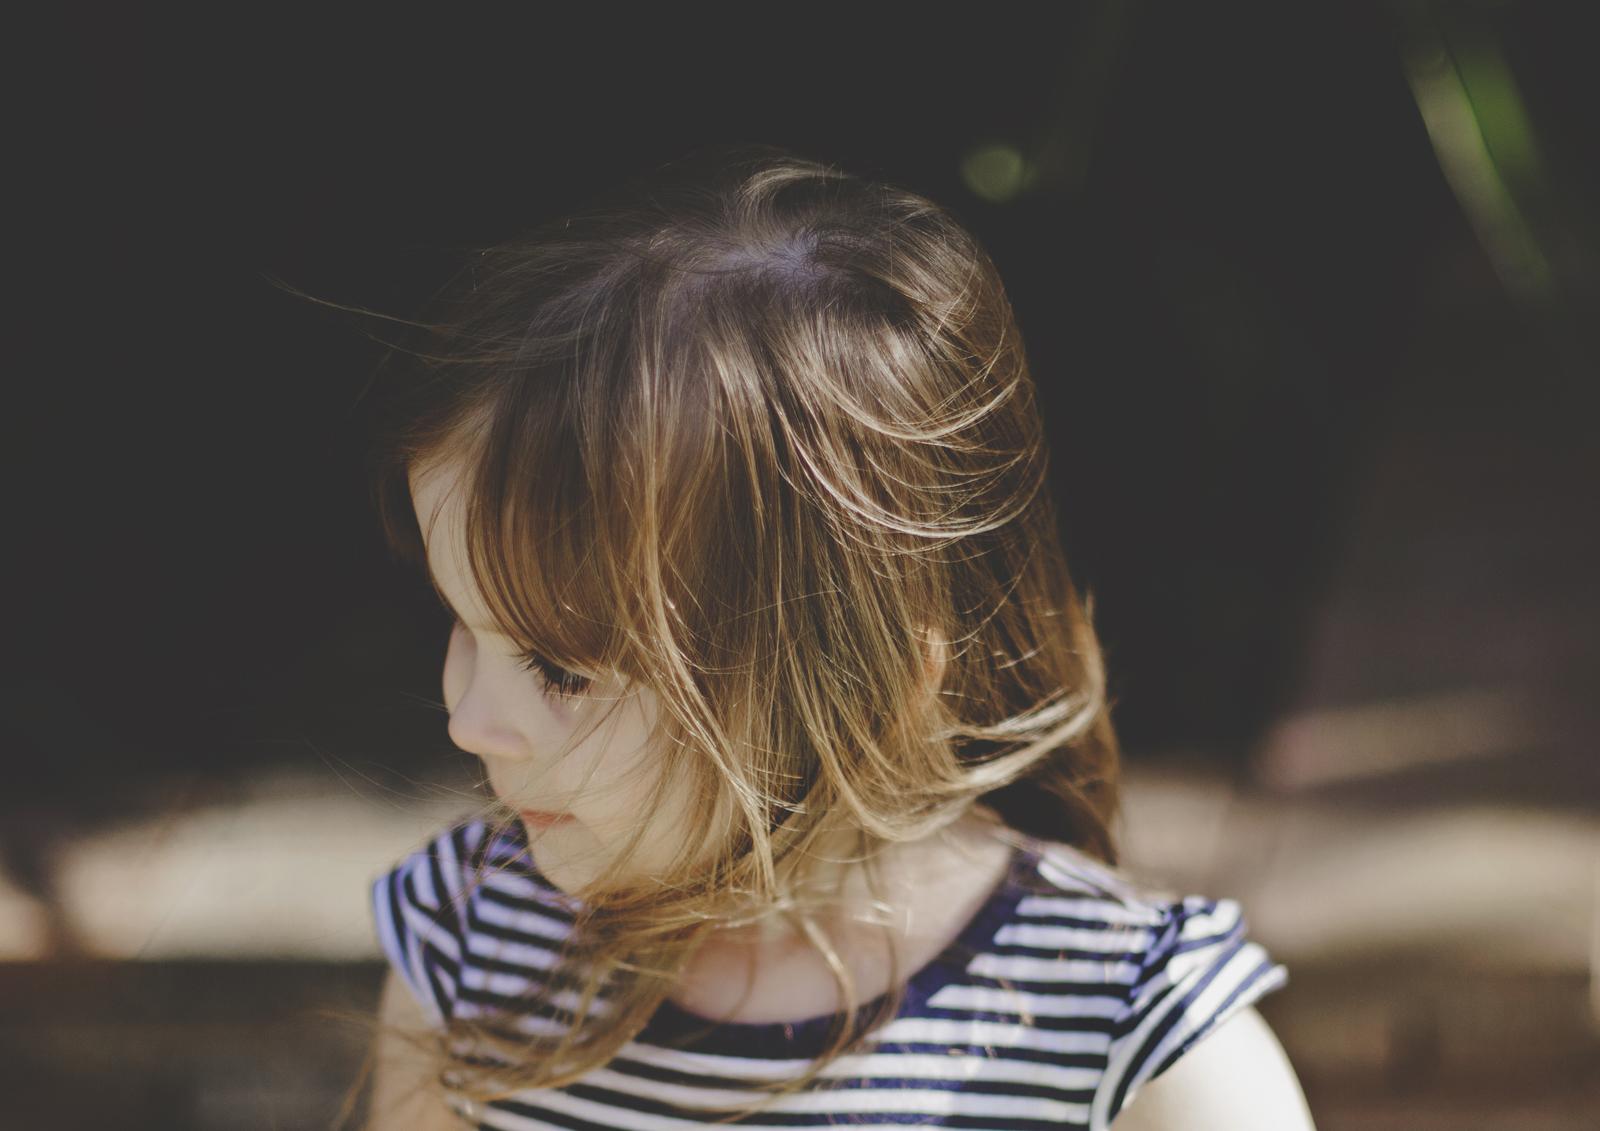 Child Photographer Bayside, Melbourne